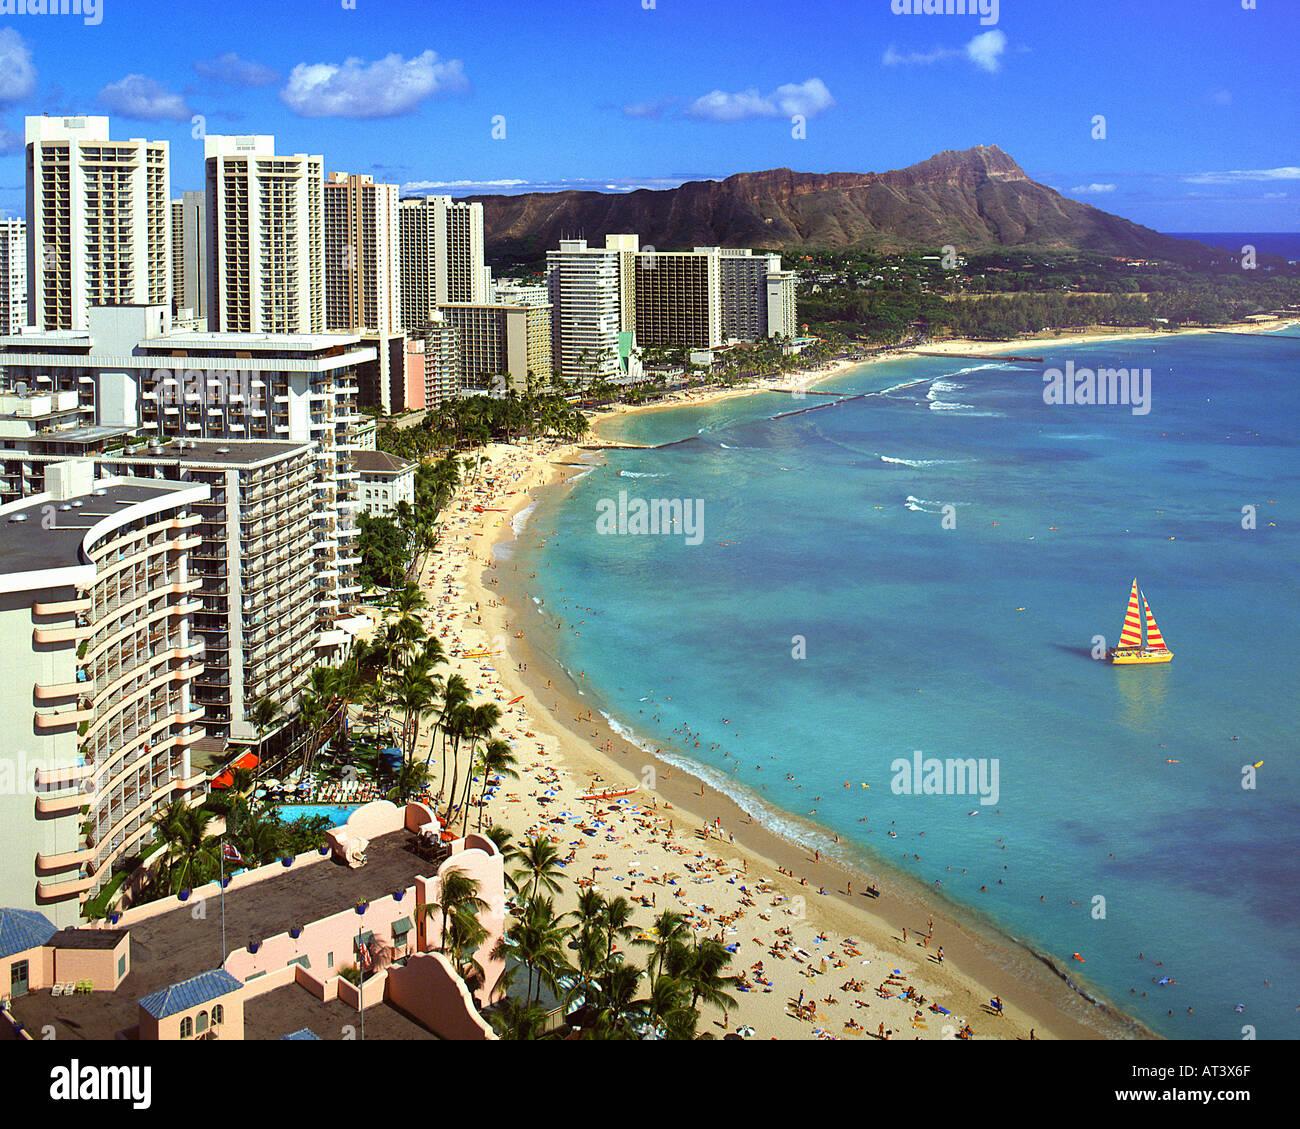 USA - HAWAII:  Waikiki Beach and Diamond Head on Oahu - Stock Image